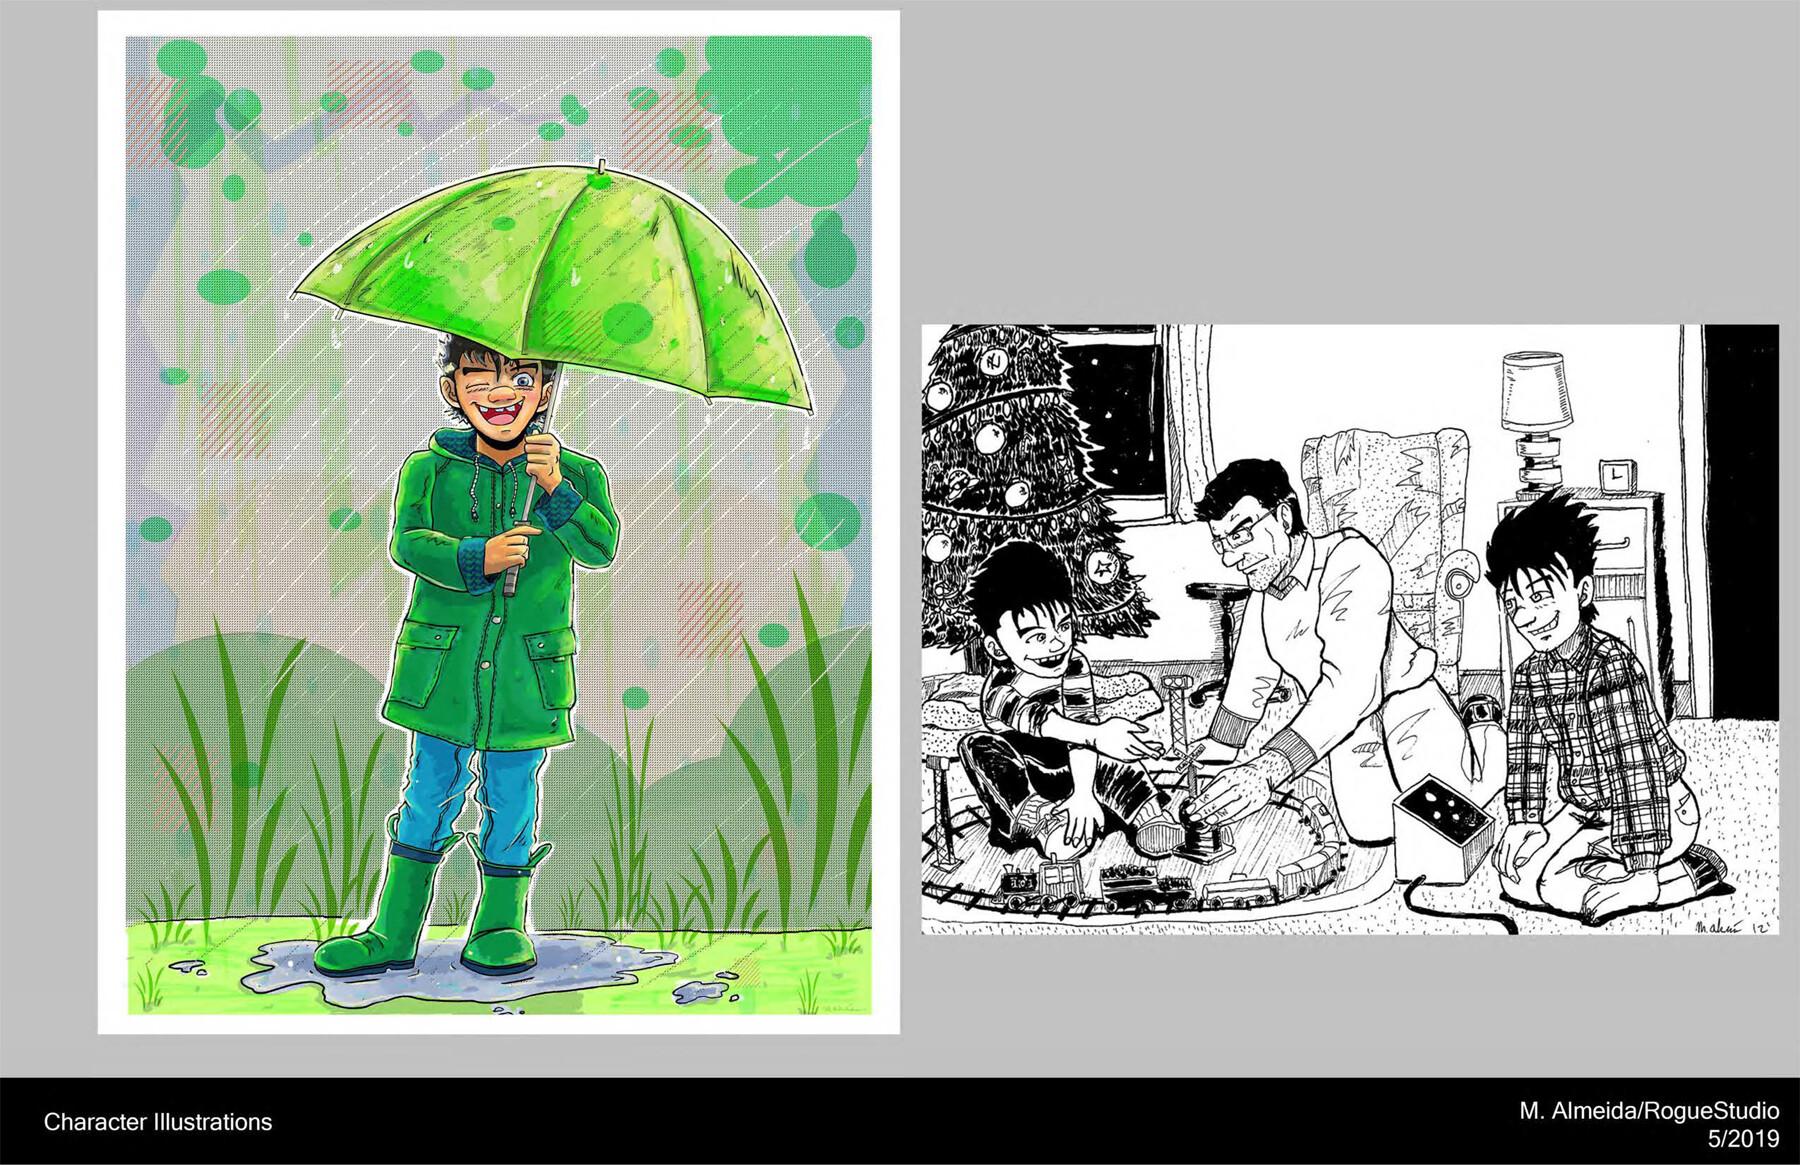 Character illustrations. Medium- Photoshop (Left), Ink (right)